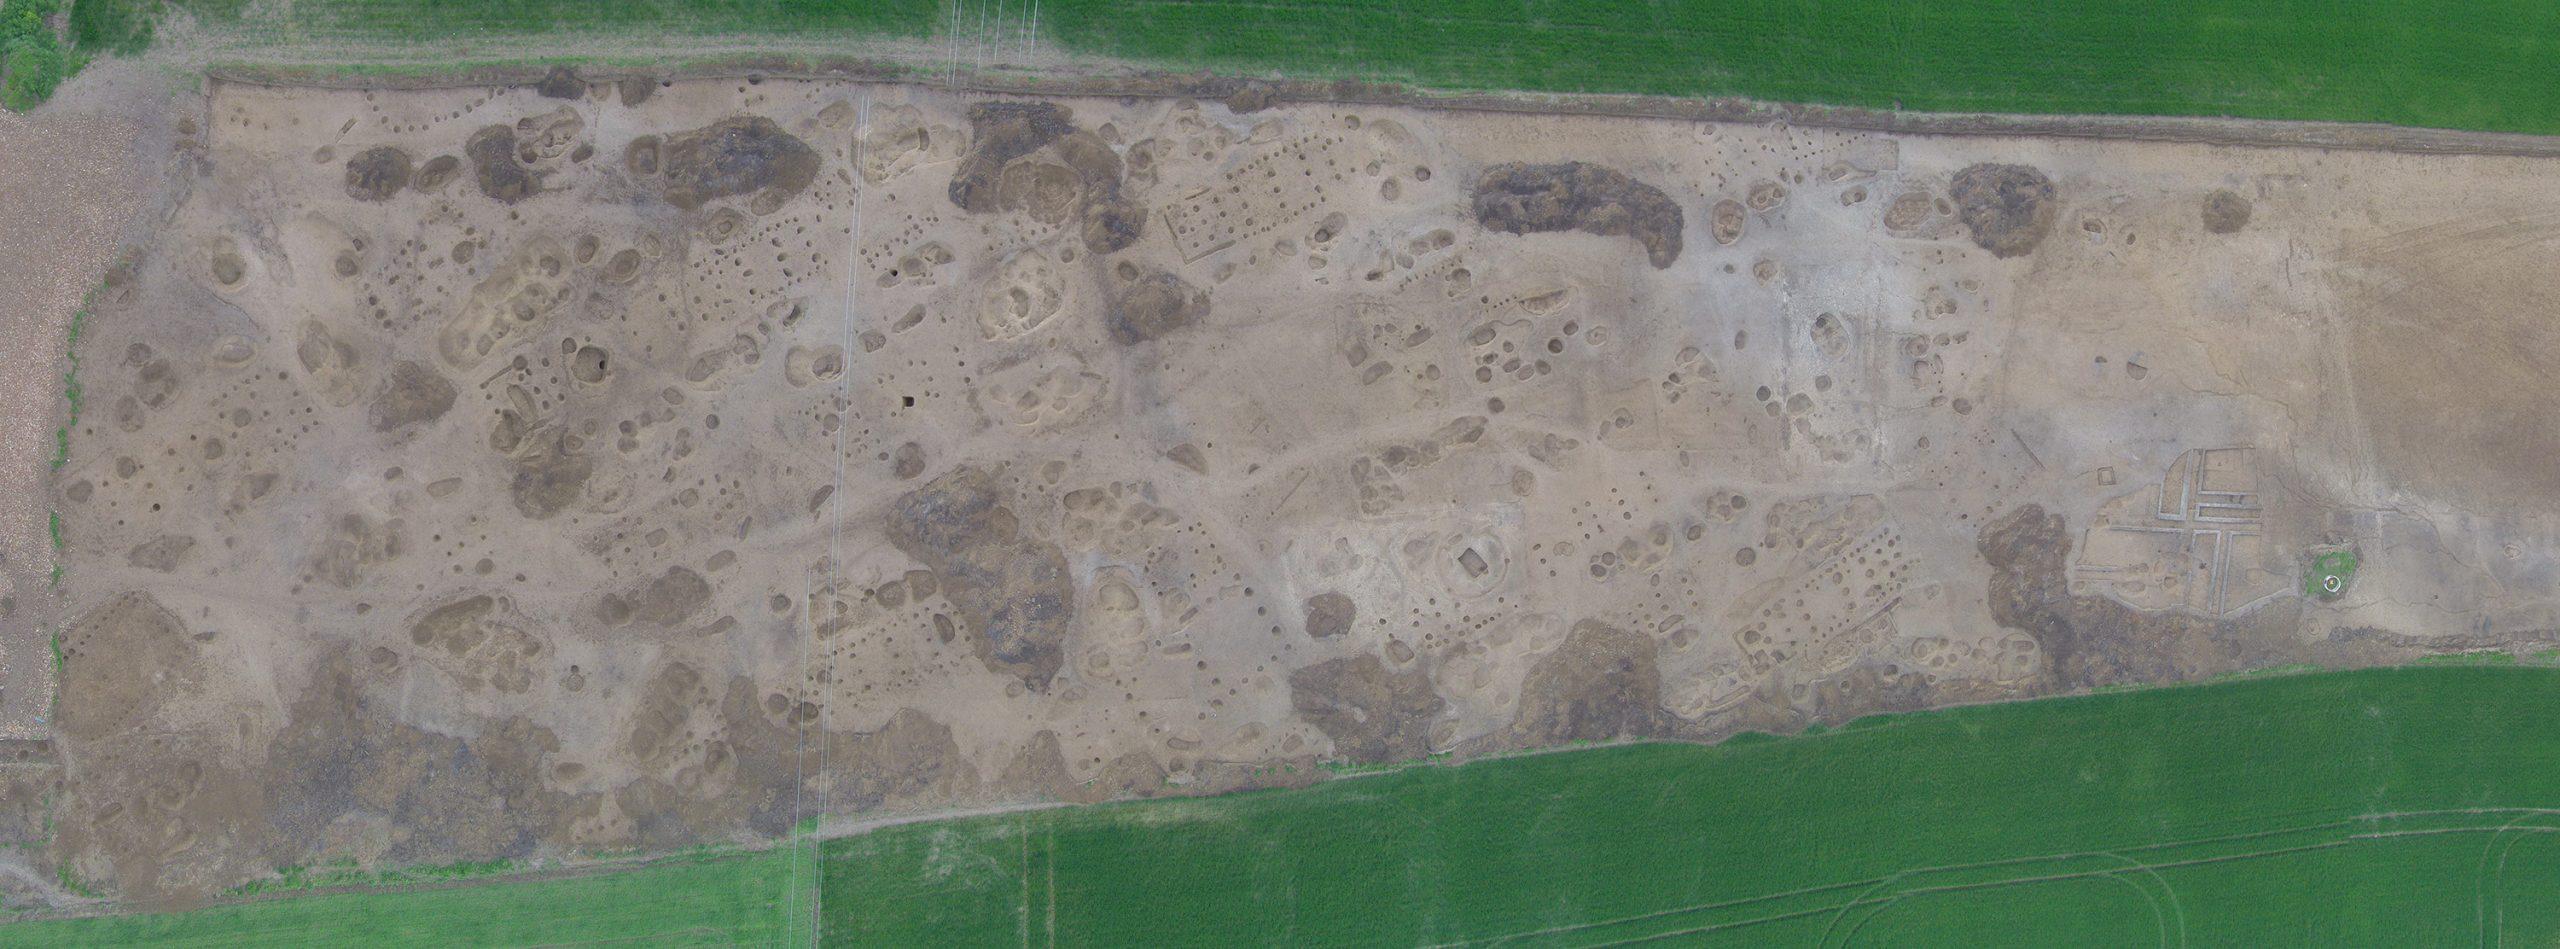 d11 highway rescue excavation